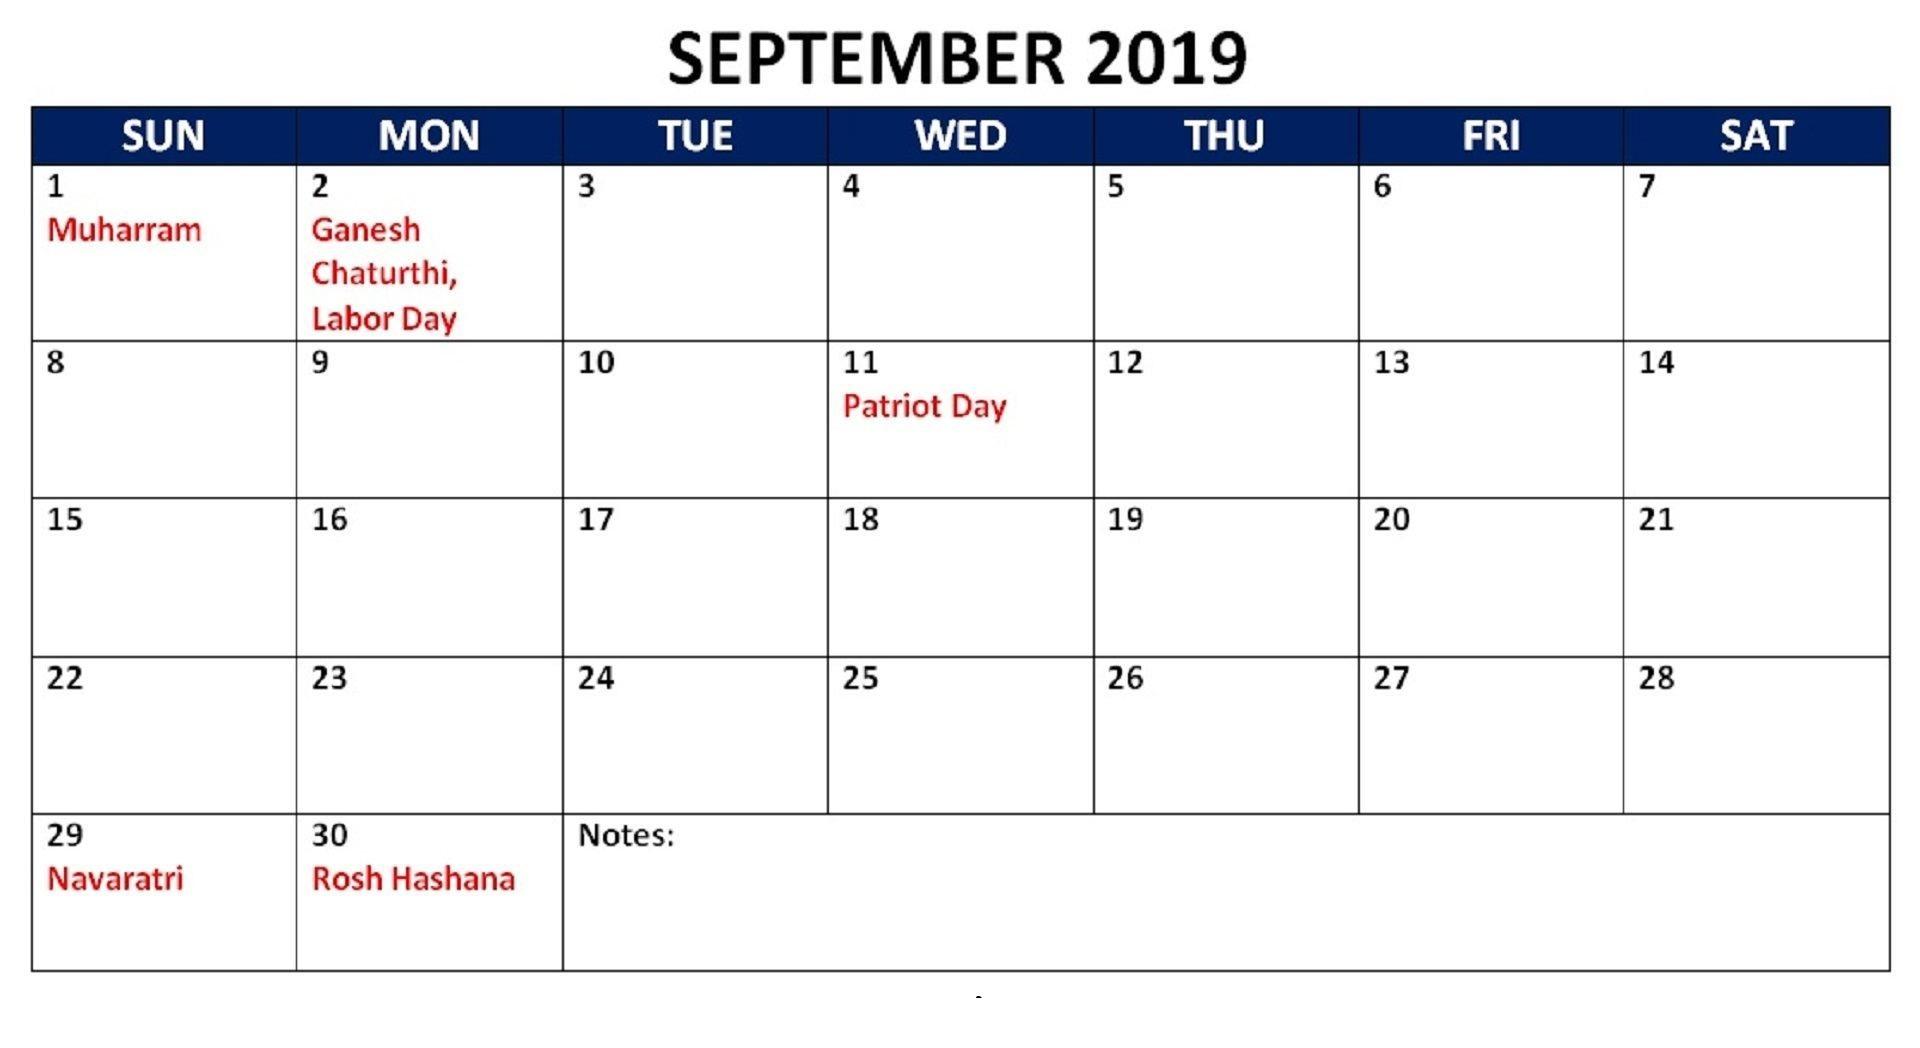 September 2019 Calendar With Holidays Public, National - Latest throughout Calendar October 2019 Pocket Calendar